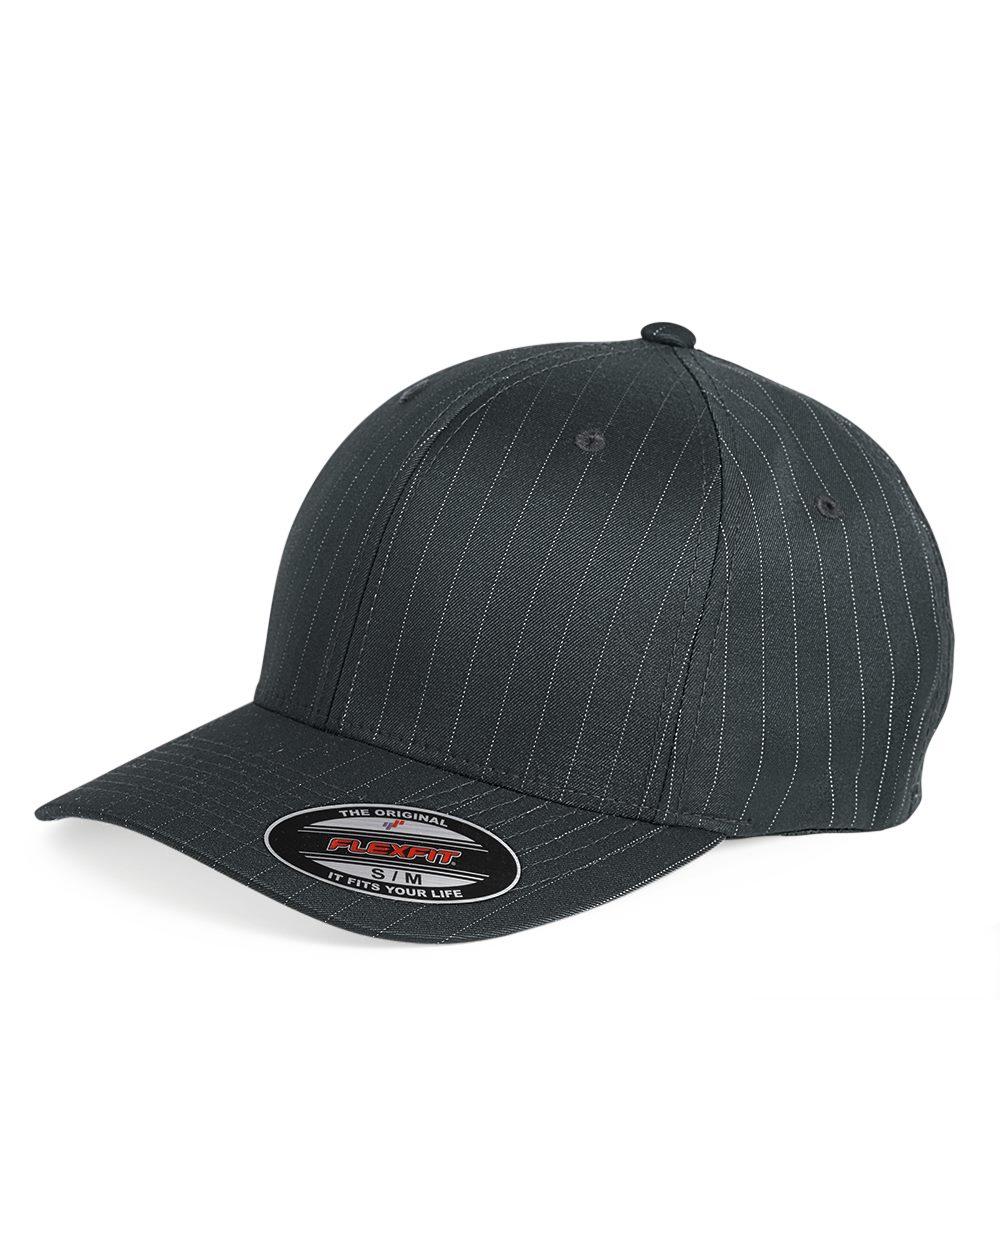 Flexfit 6195P - Pinstripe Cap